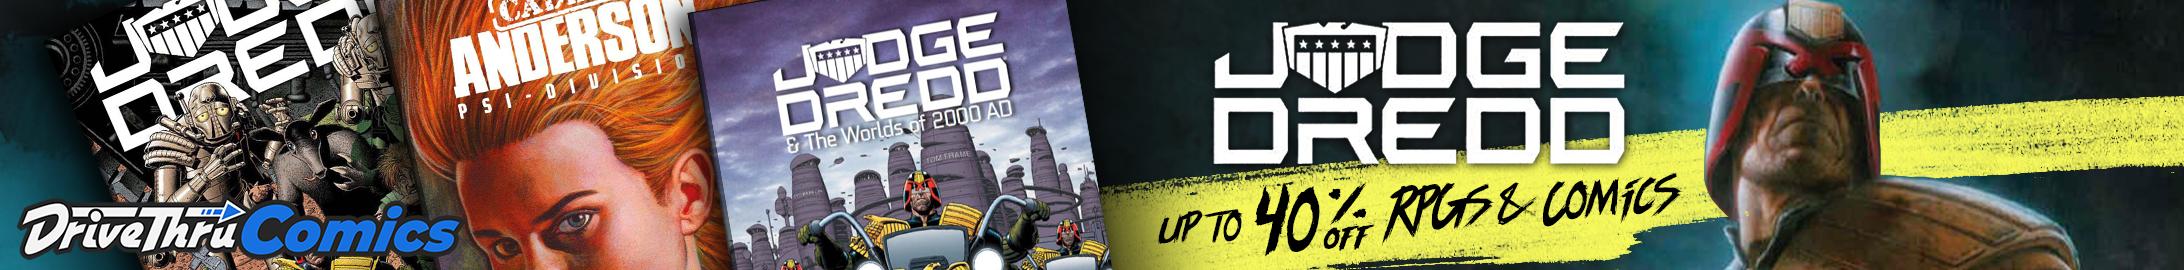 Judge Dredd Sale @ DriveThruRPG.com